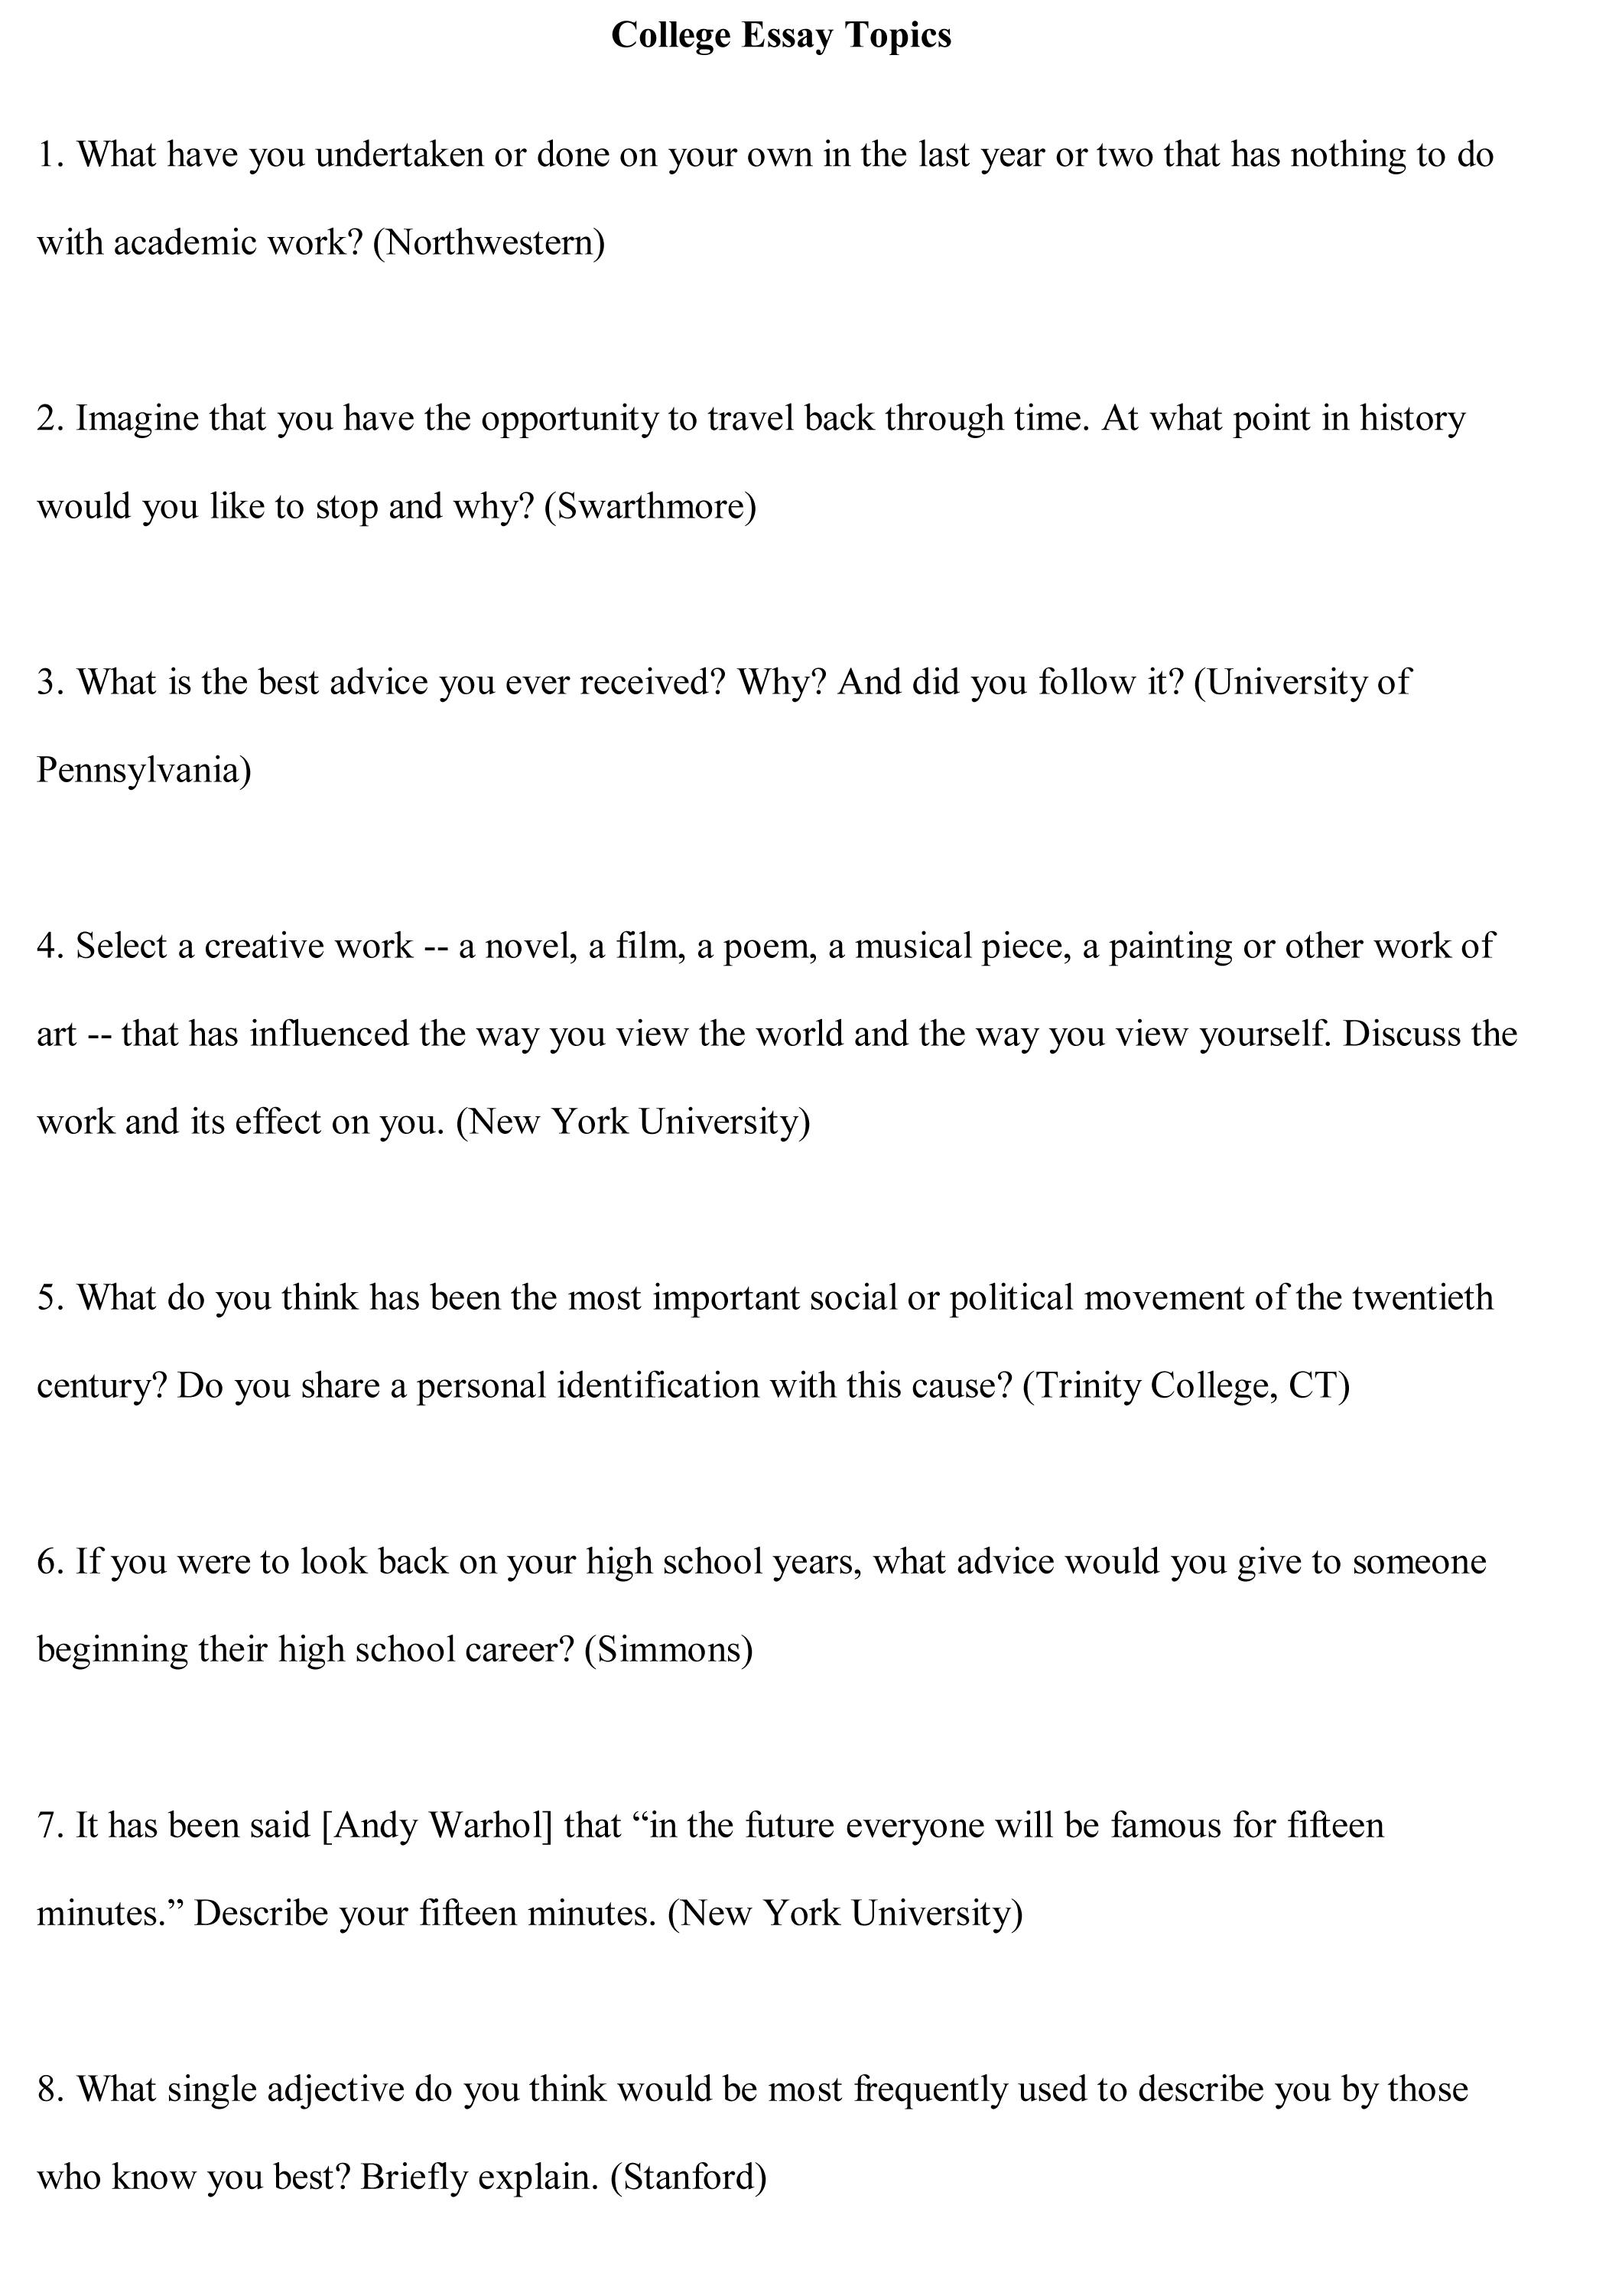 good example of college essays